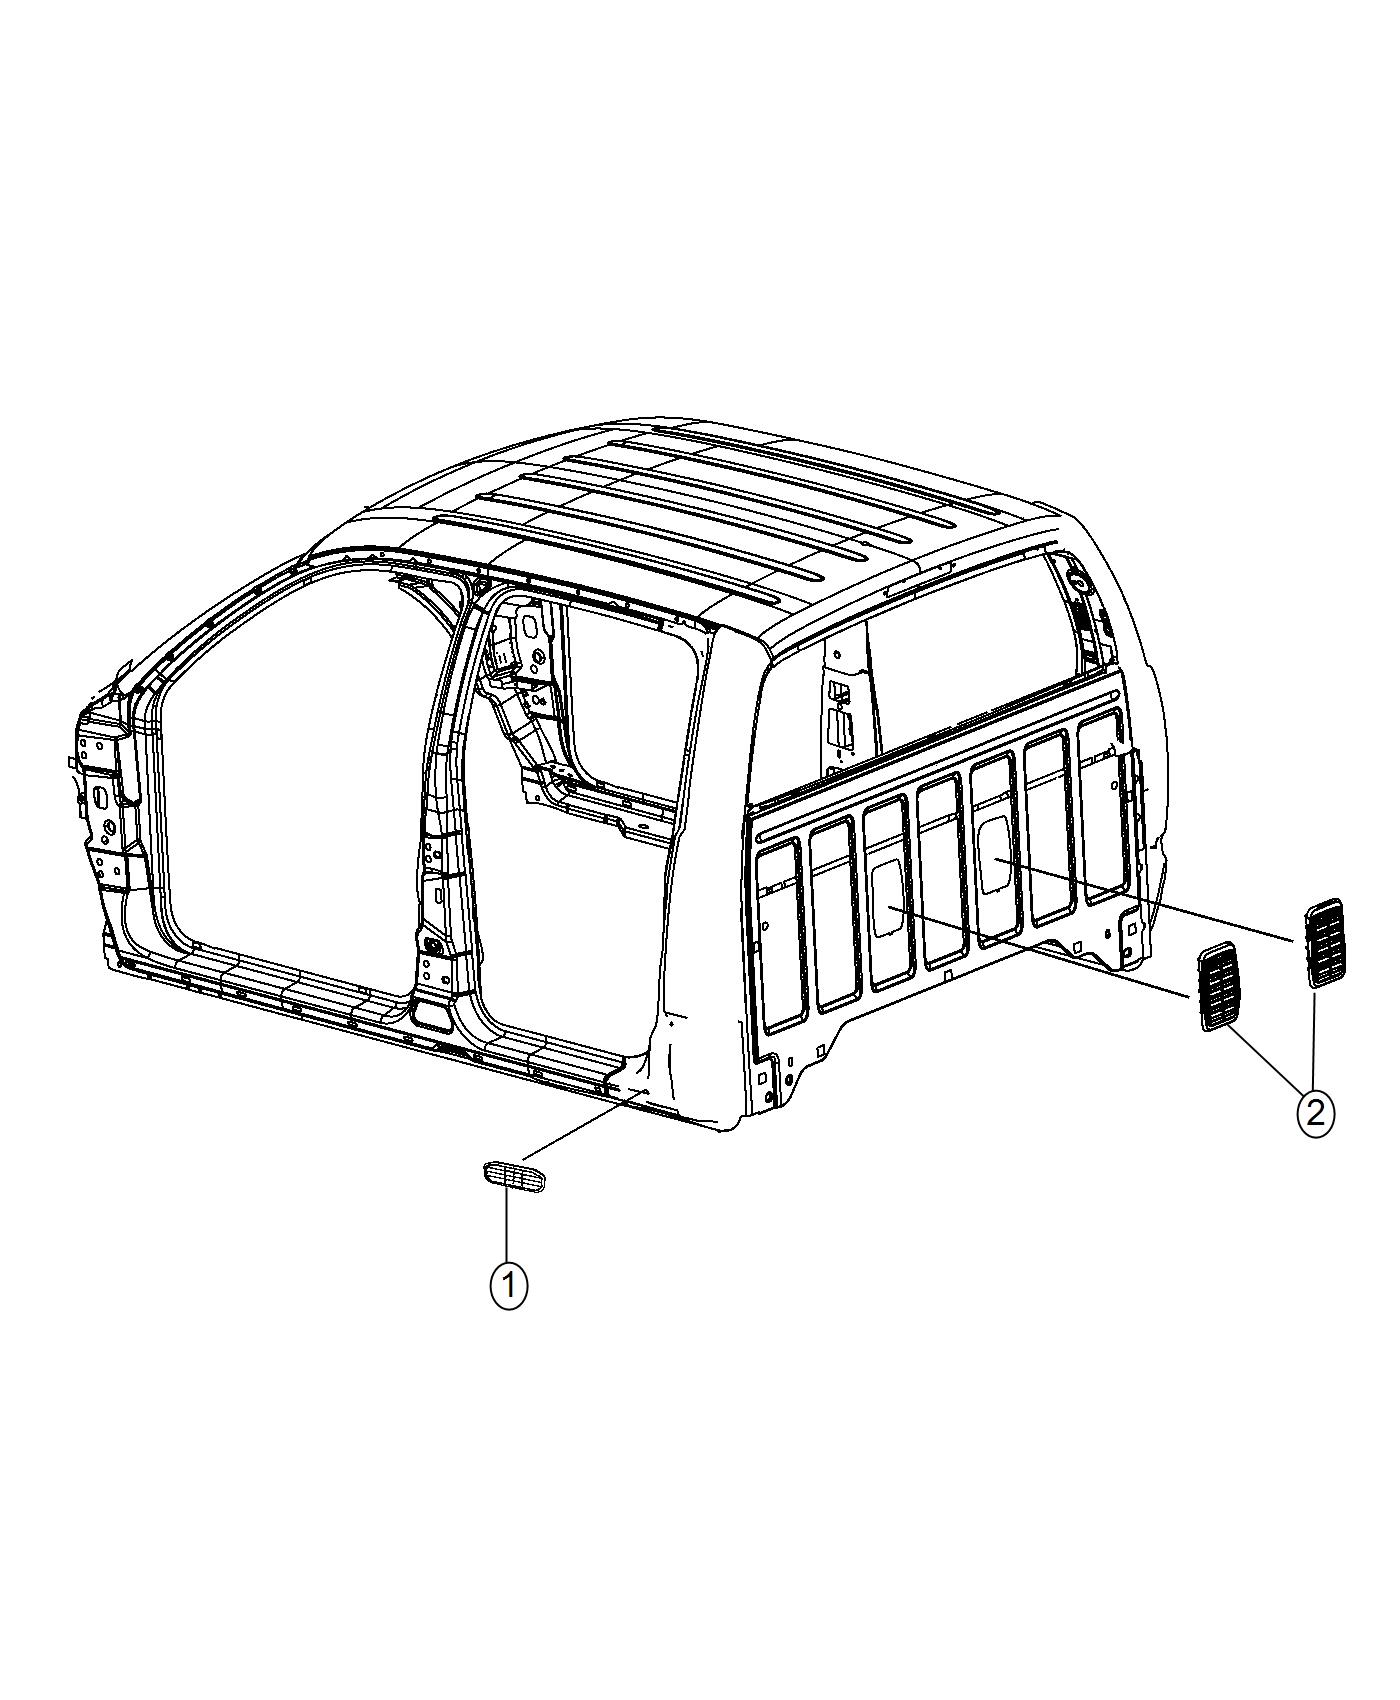 Ram Exhauster Grille Bodyside Aperture Vent